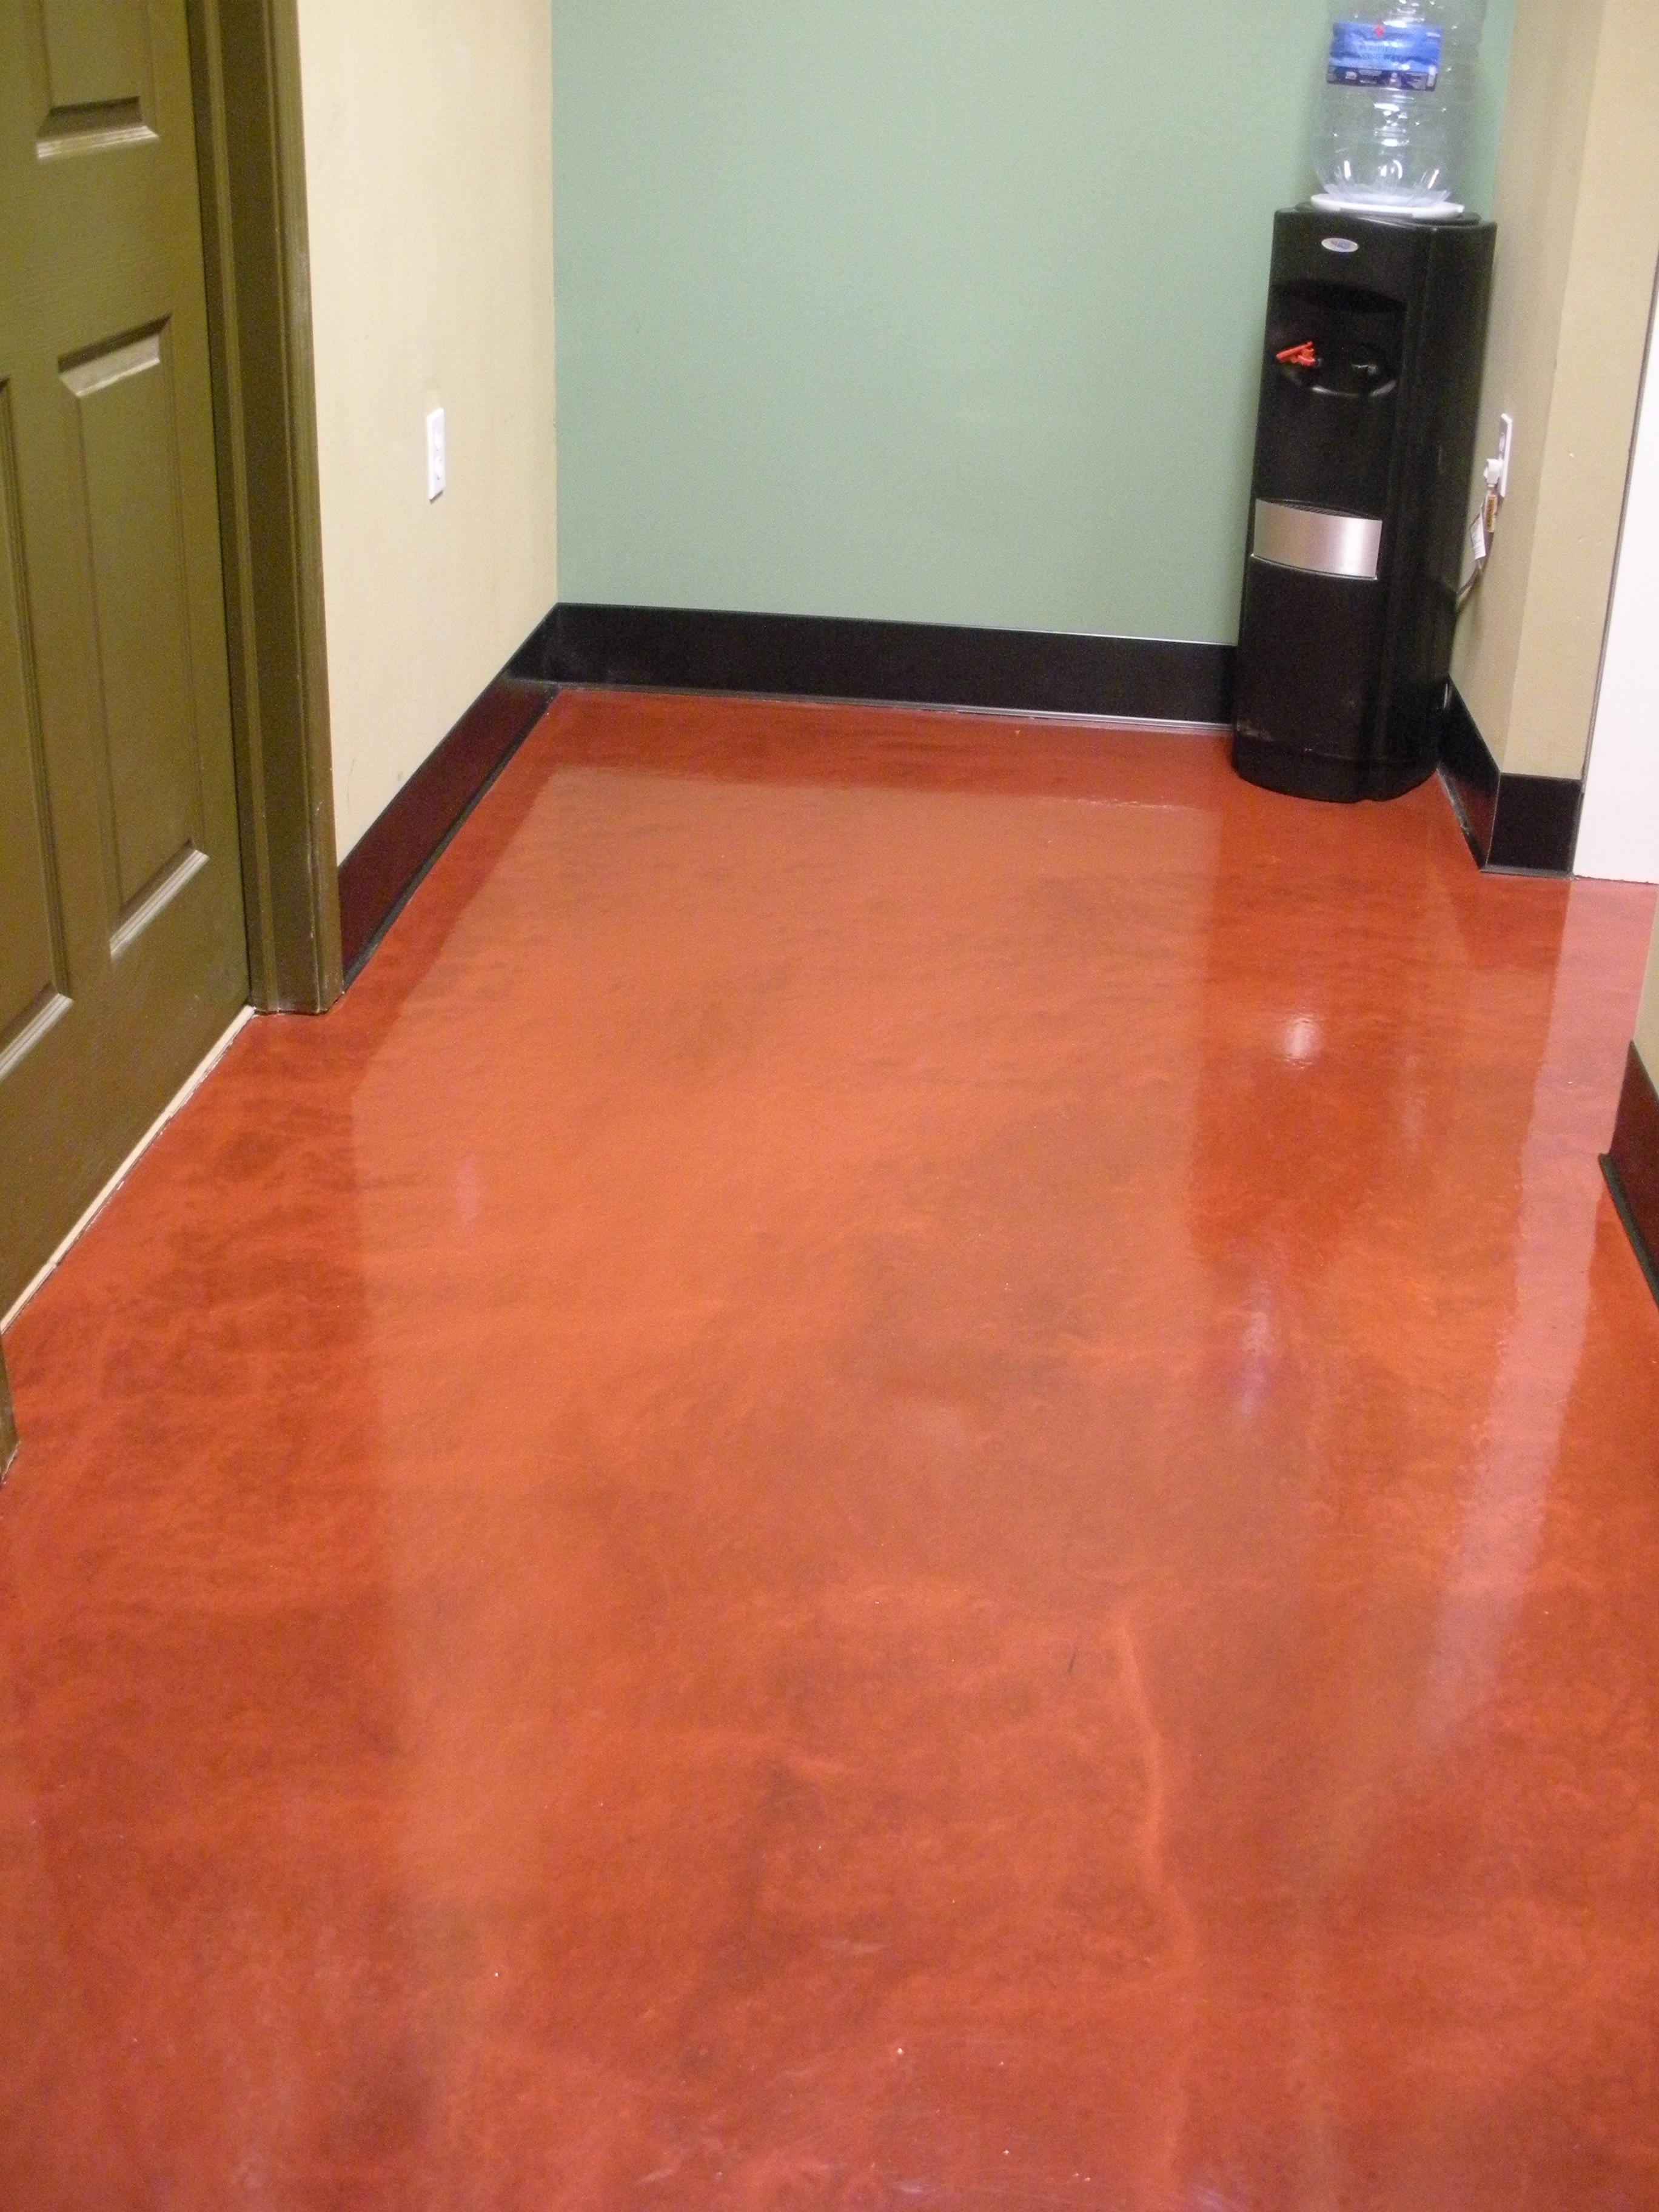 Metallic epoxy concrete floor coating